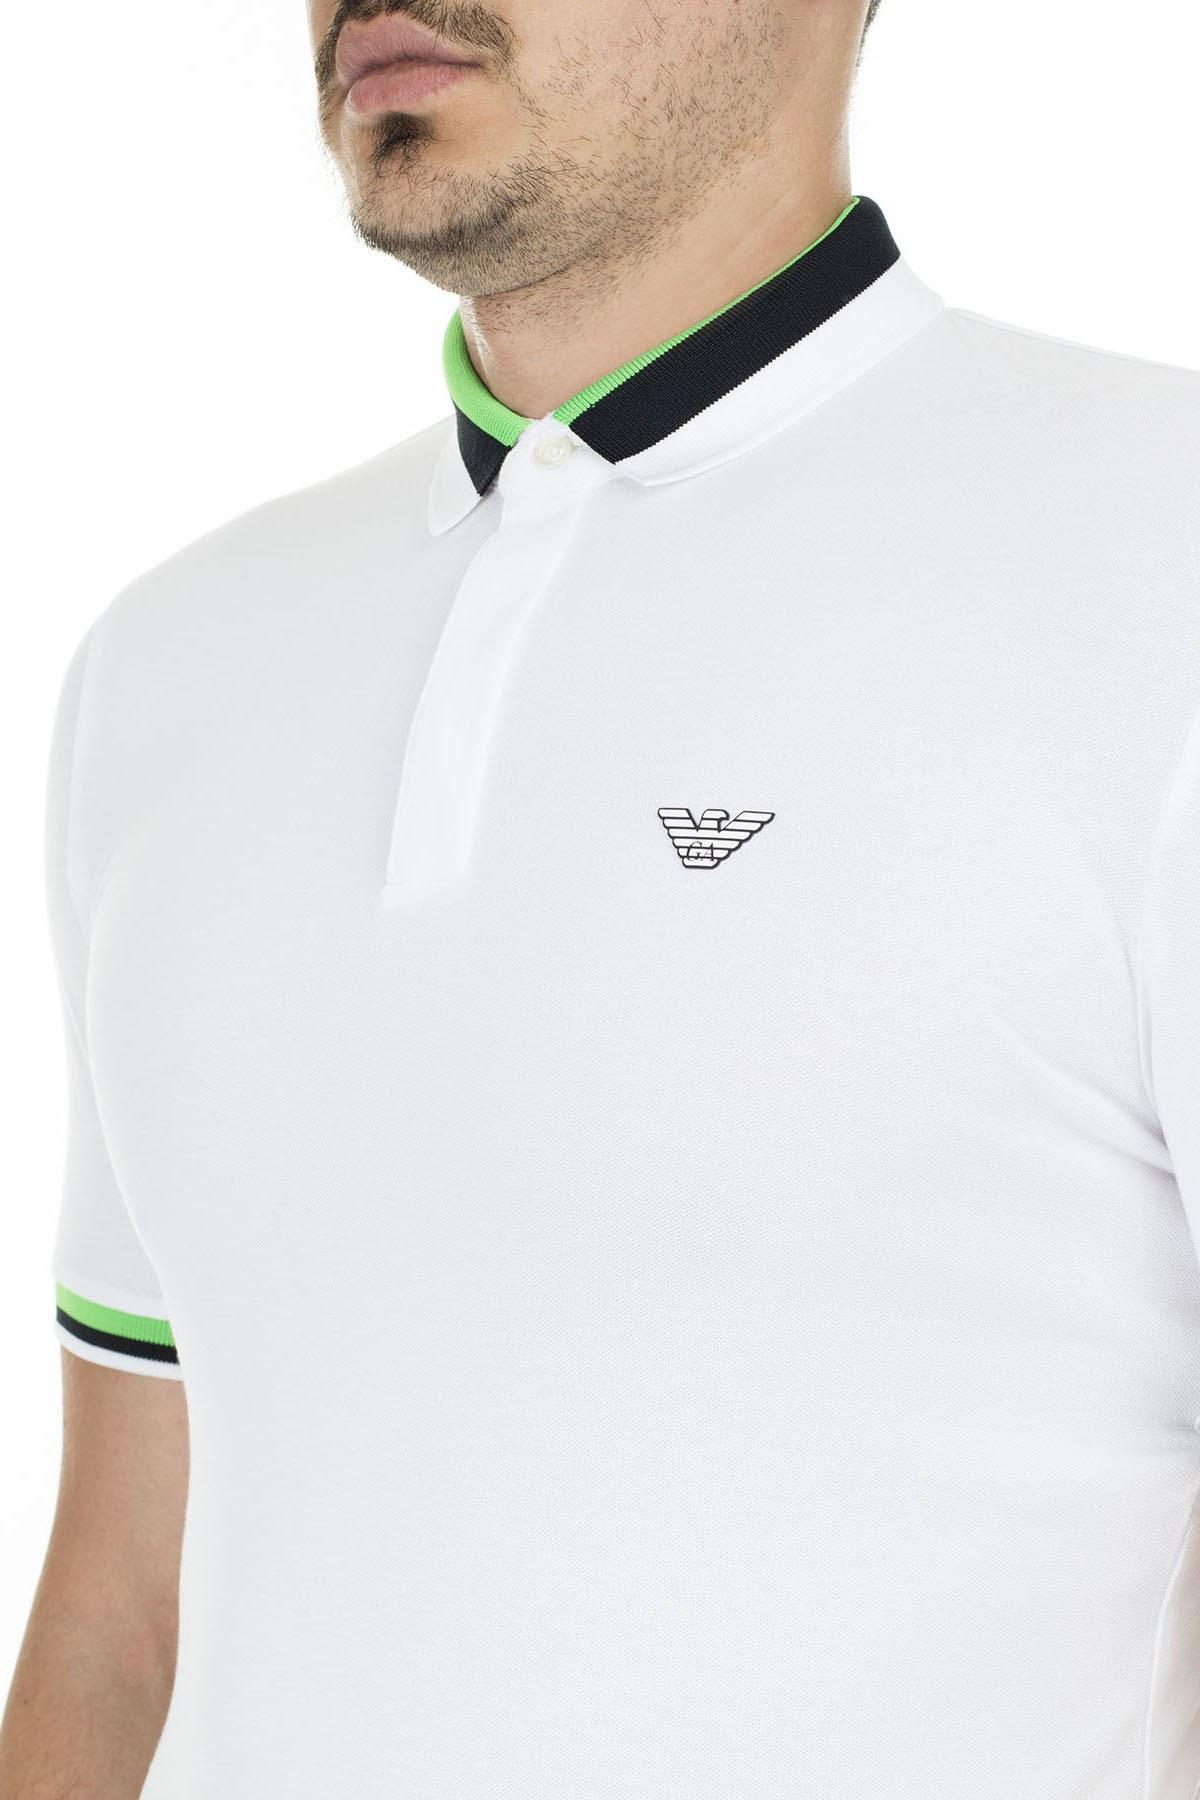 Emporio Armani Pamuklu Düğmeli T Shirt Erkek Polo 3H1F84 1J46Z 0102 BEYAZ